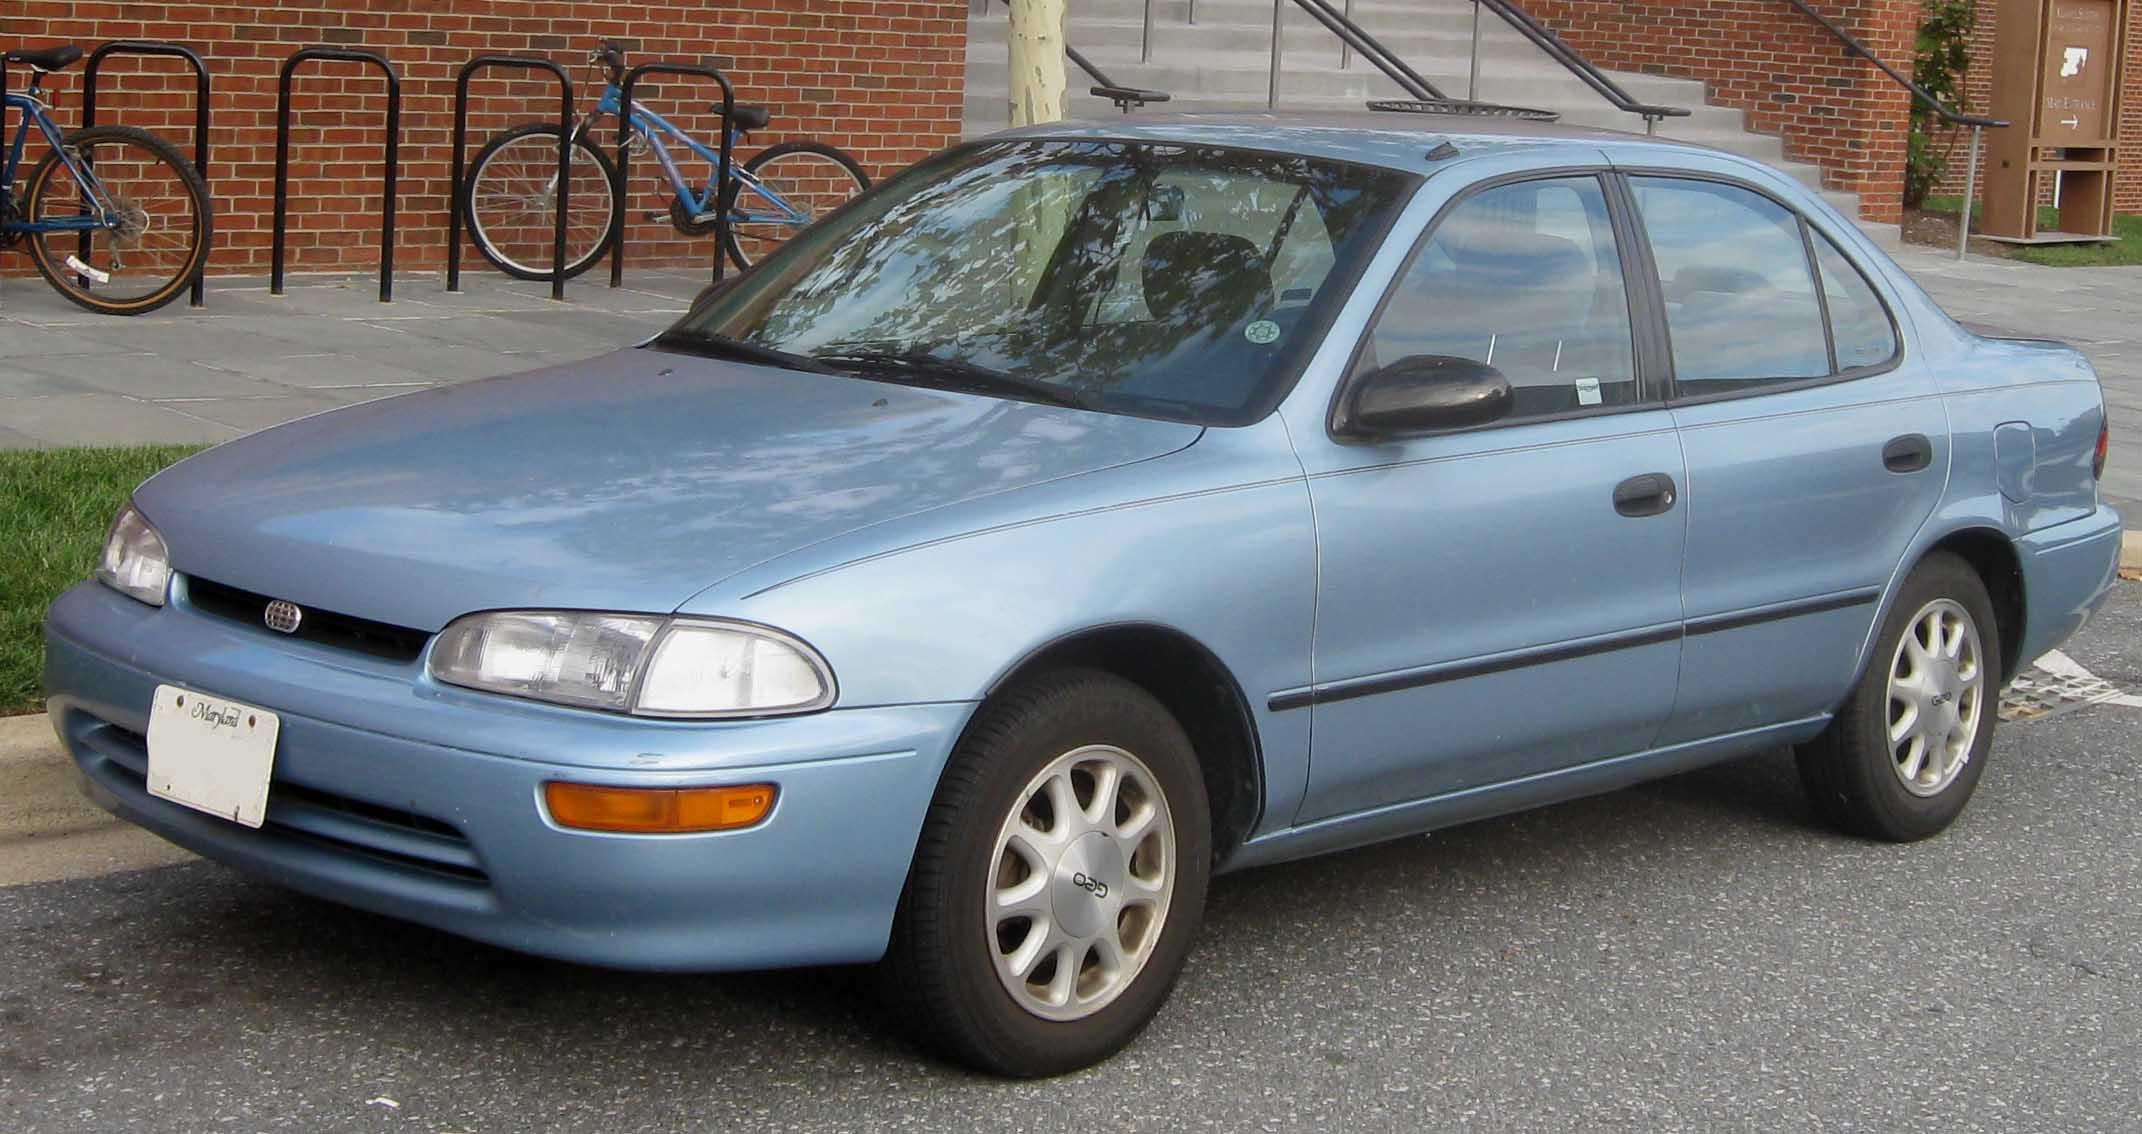 Chevrolet Prizm 2002 foto - 5